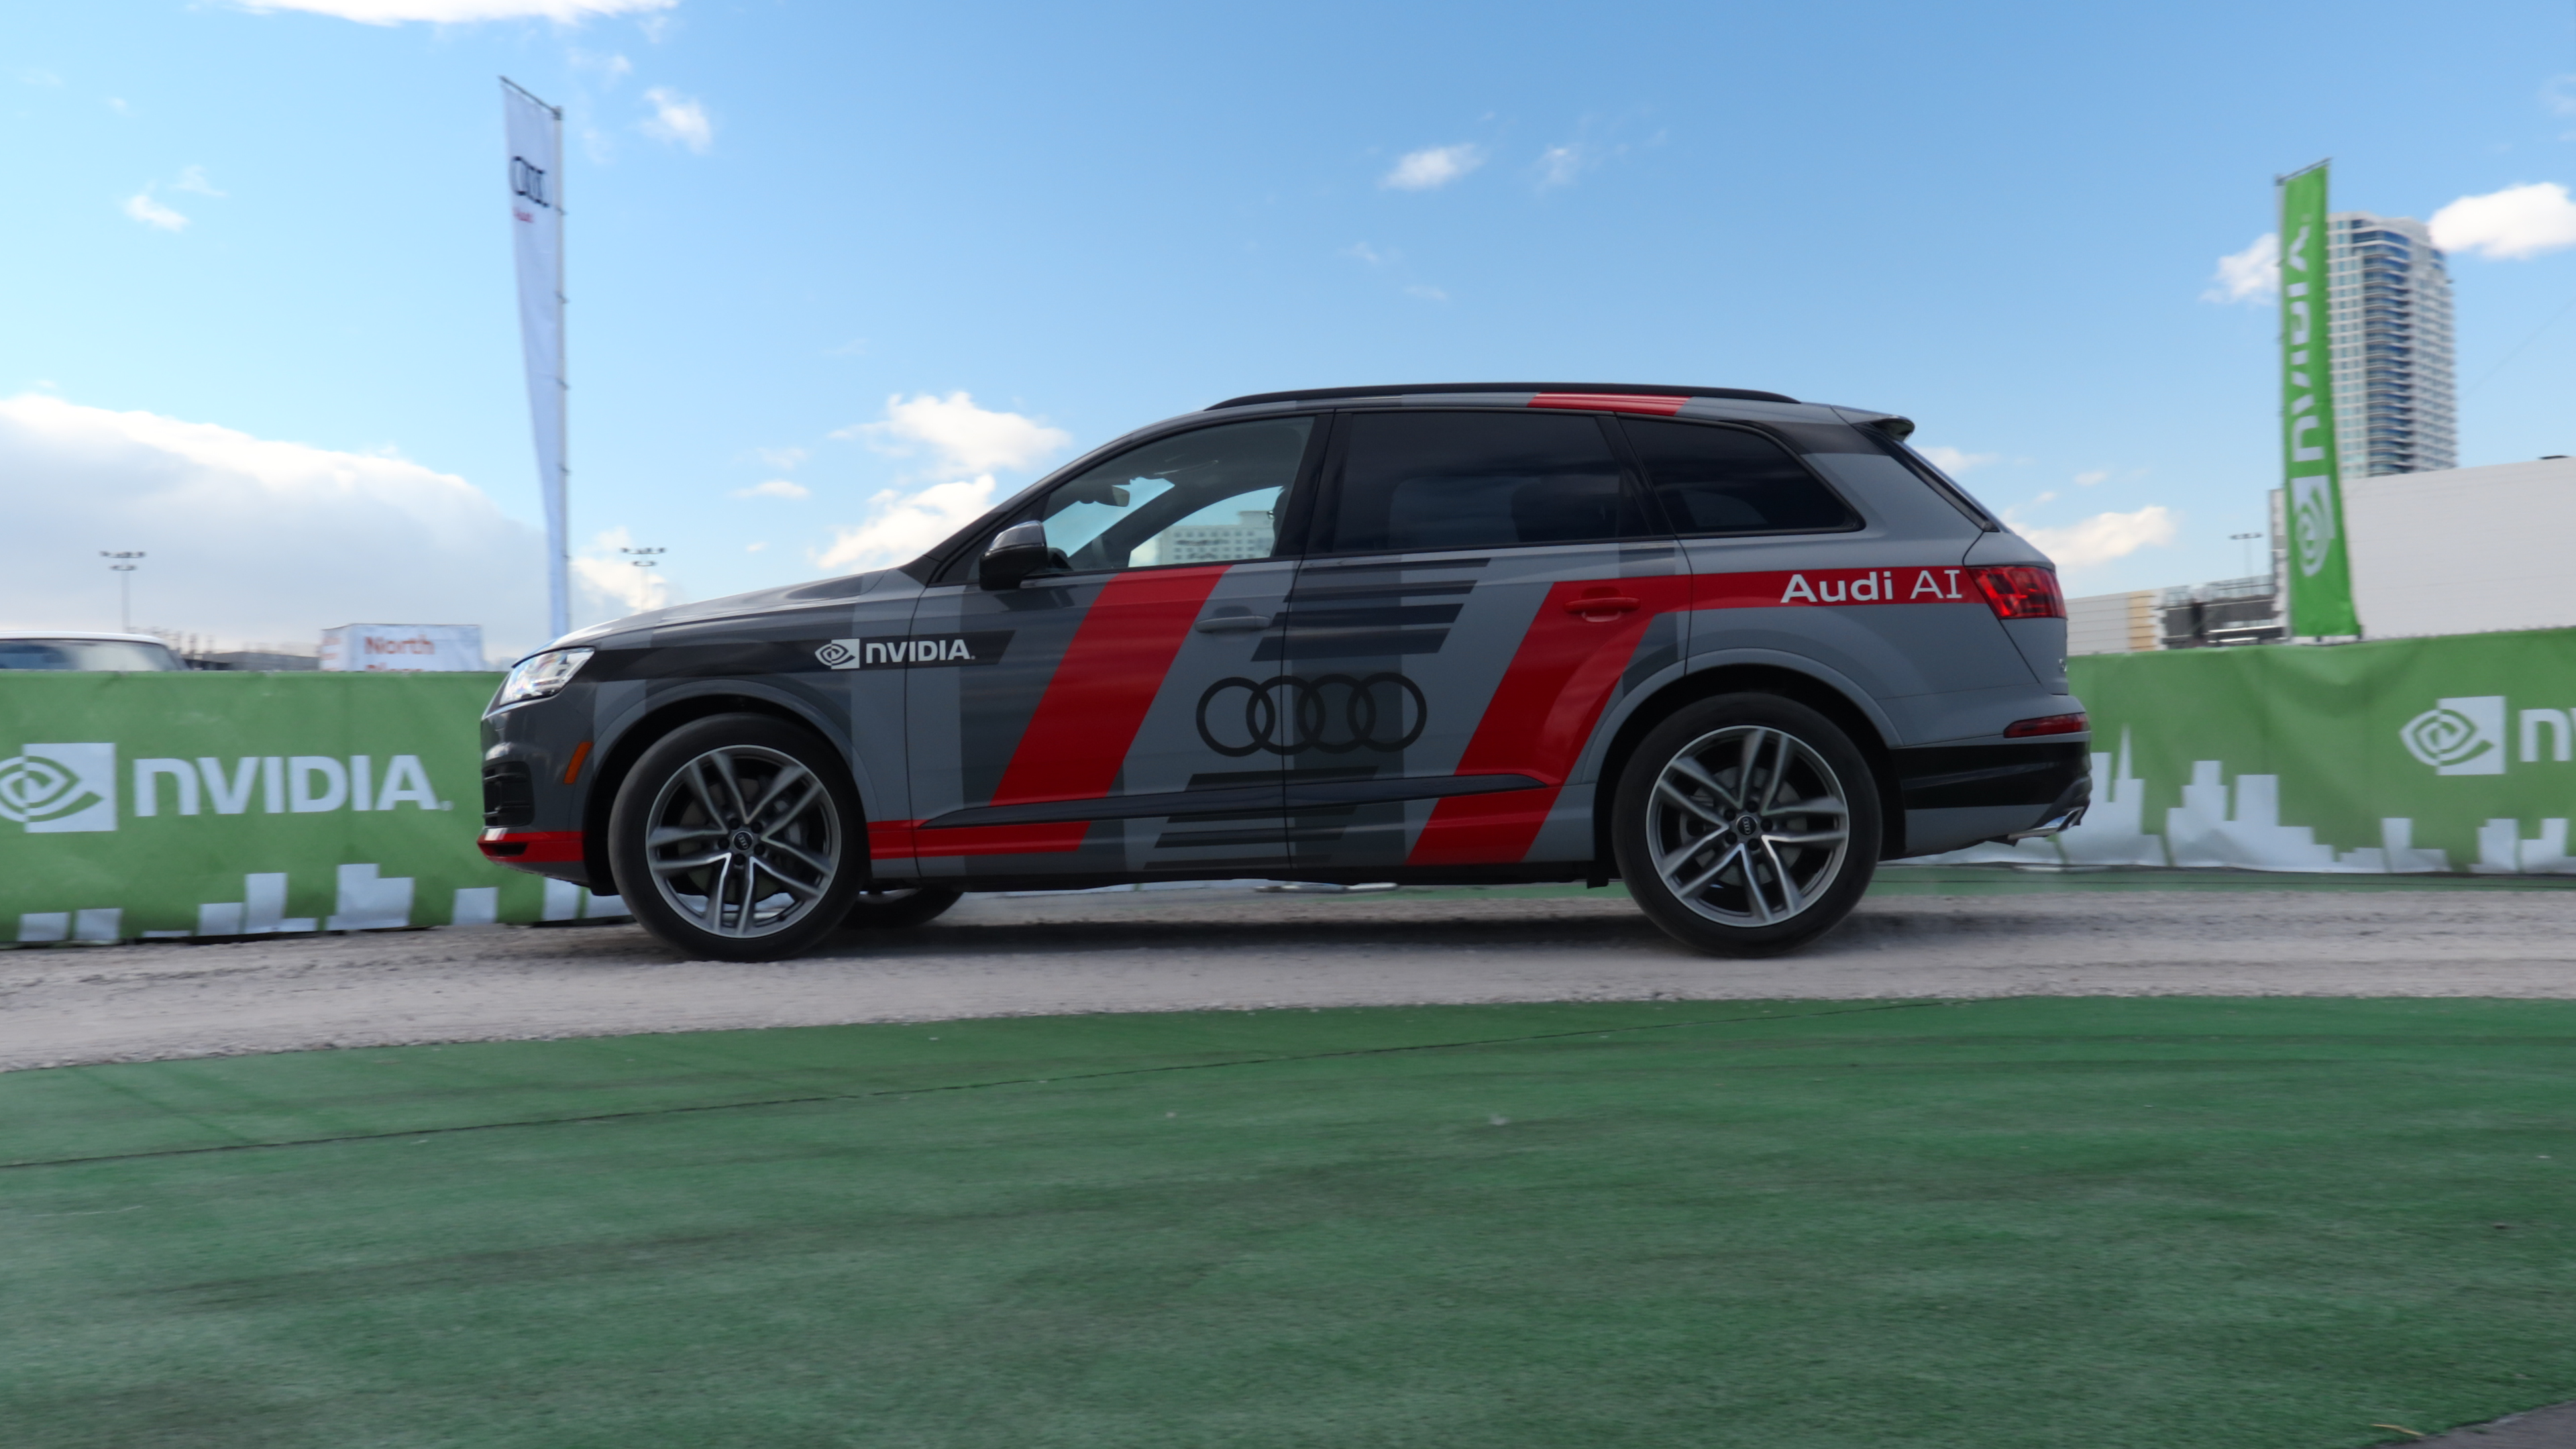 AUDI Q7 inteligenta artificiala nvidia ai masini autonome xavier